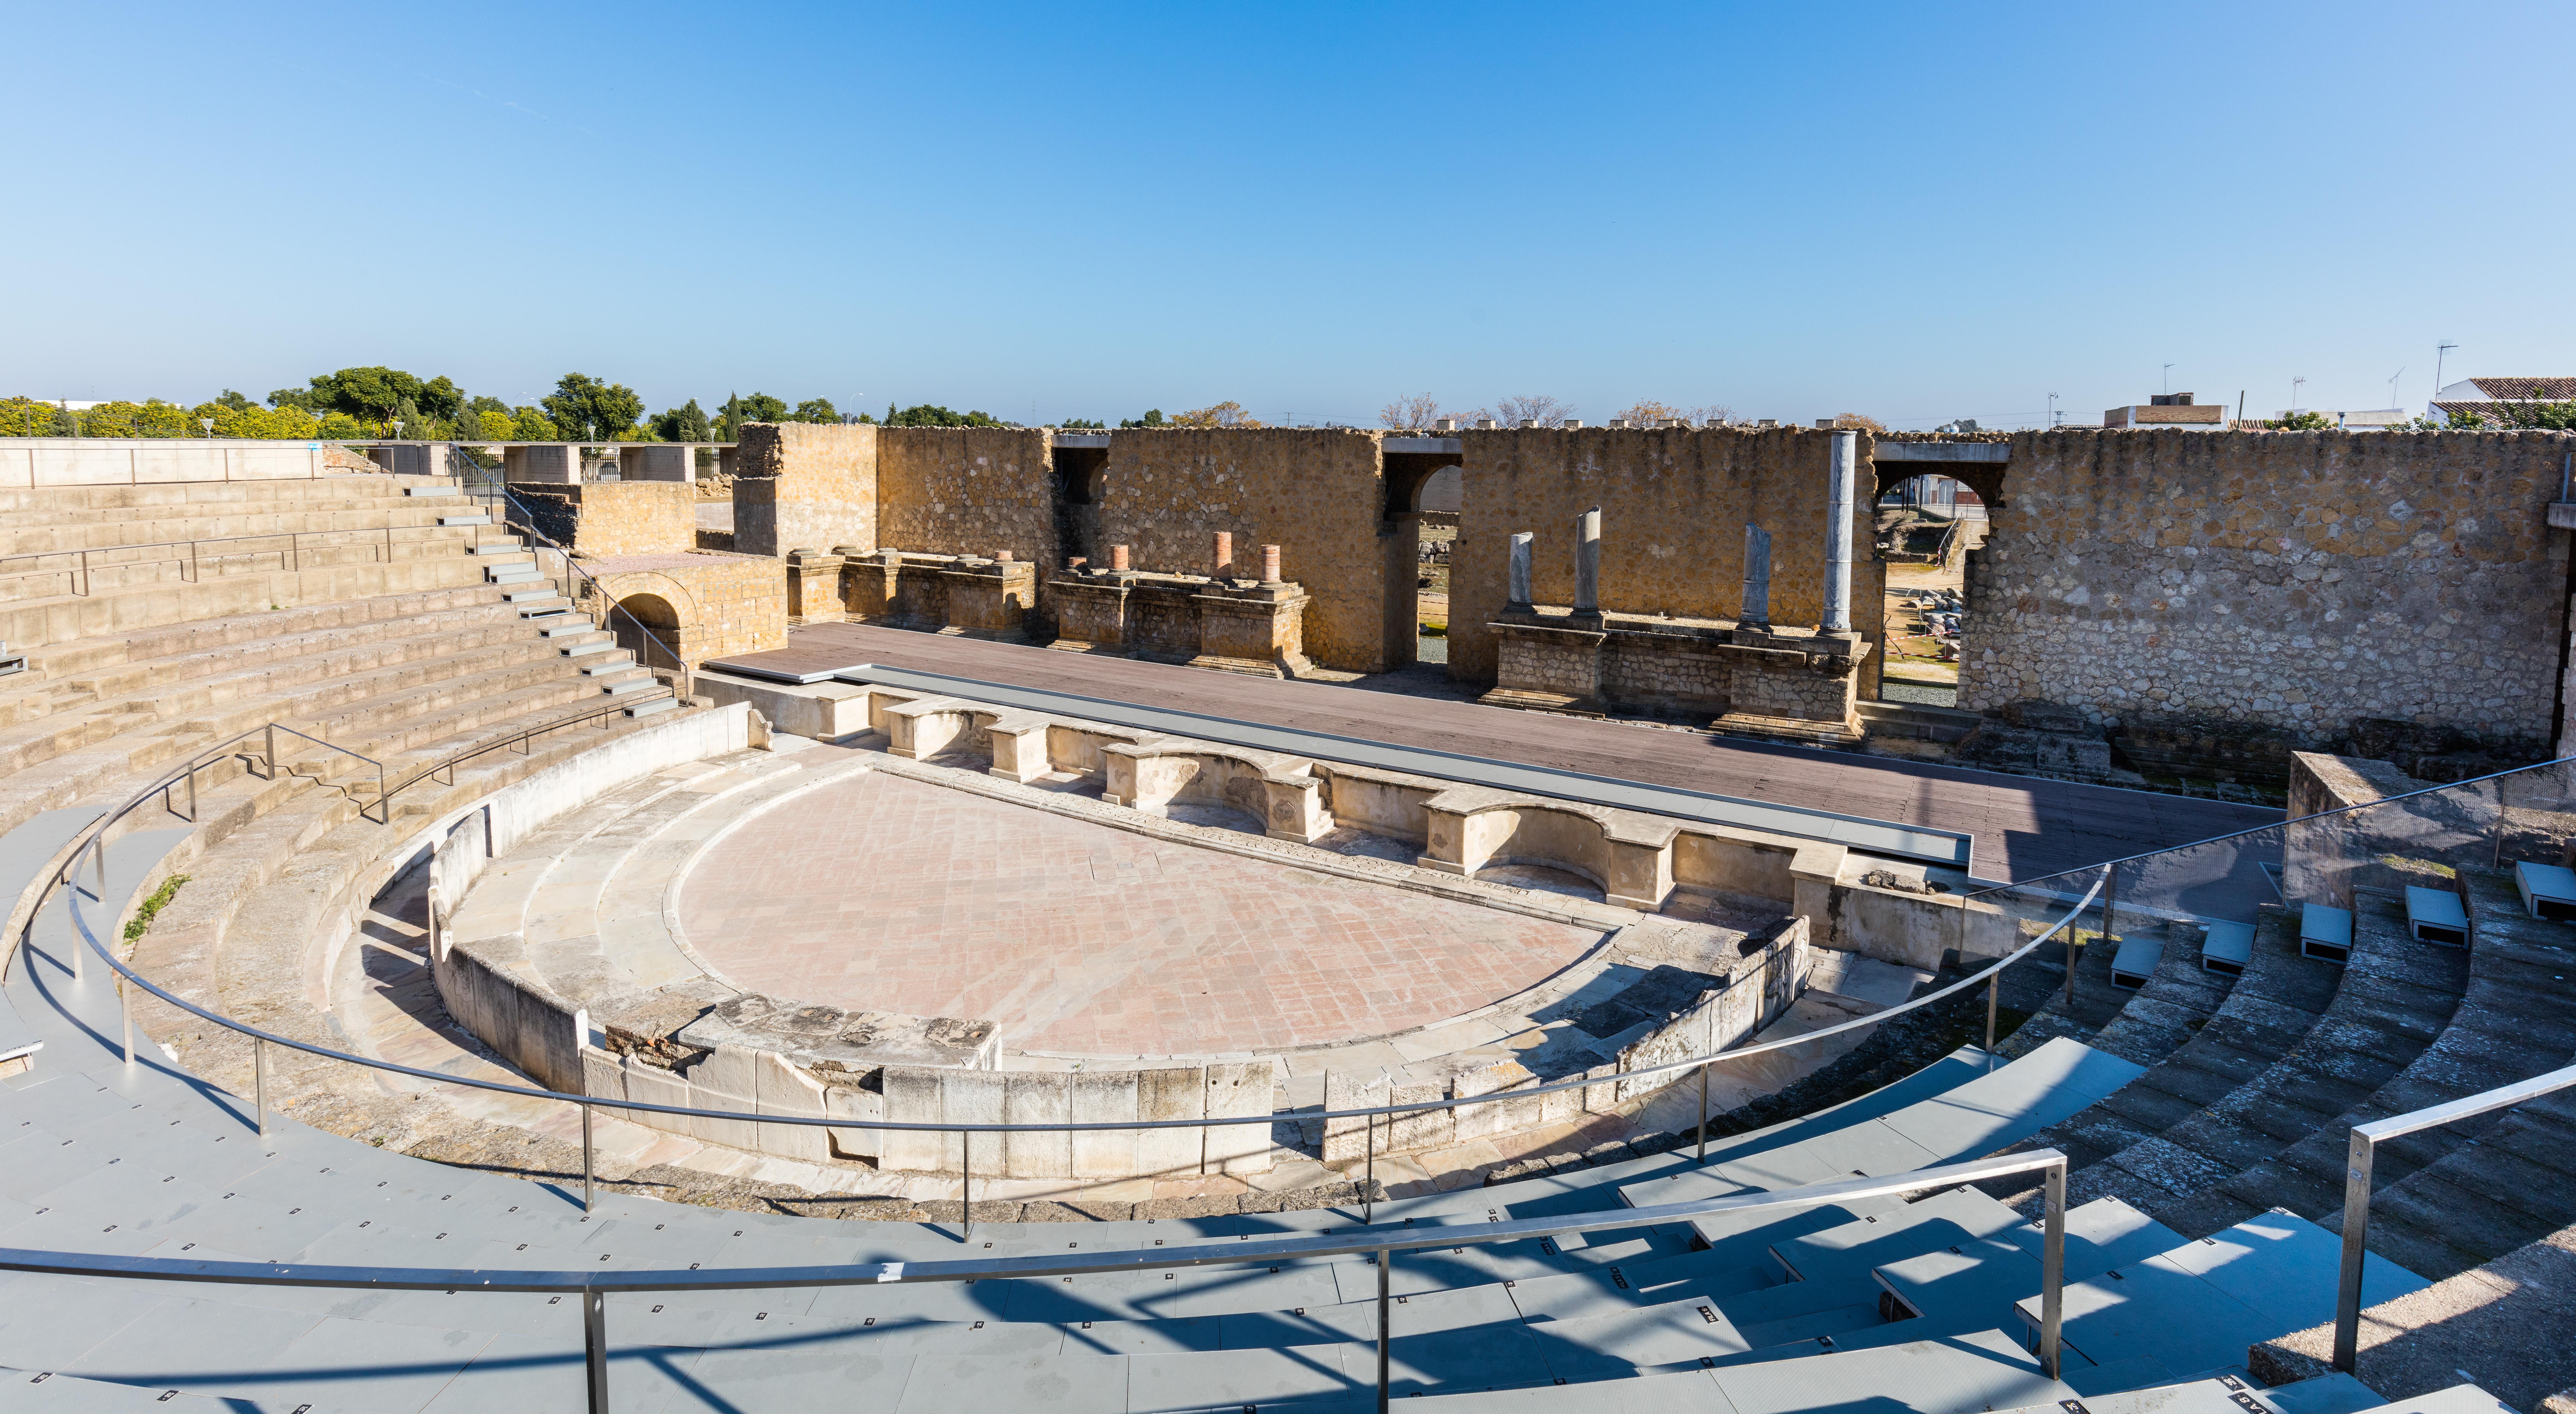 File:Teatro romano de Itálica, Santiponce, Sevilla, España, 2015-12-06, DD 46...